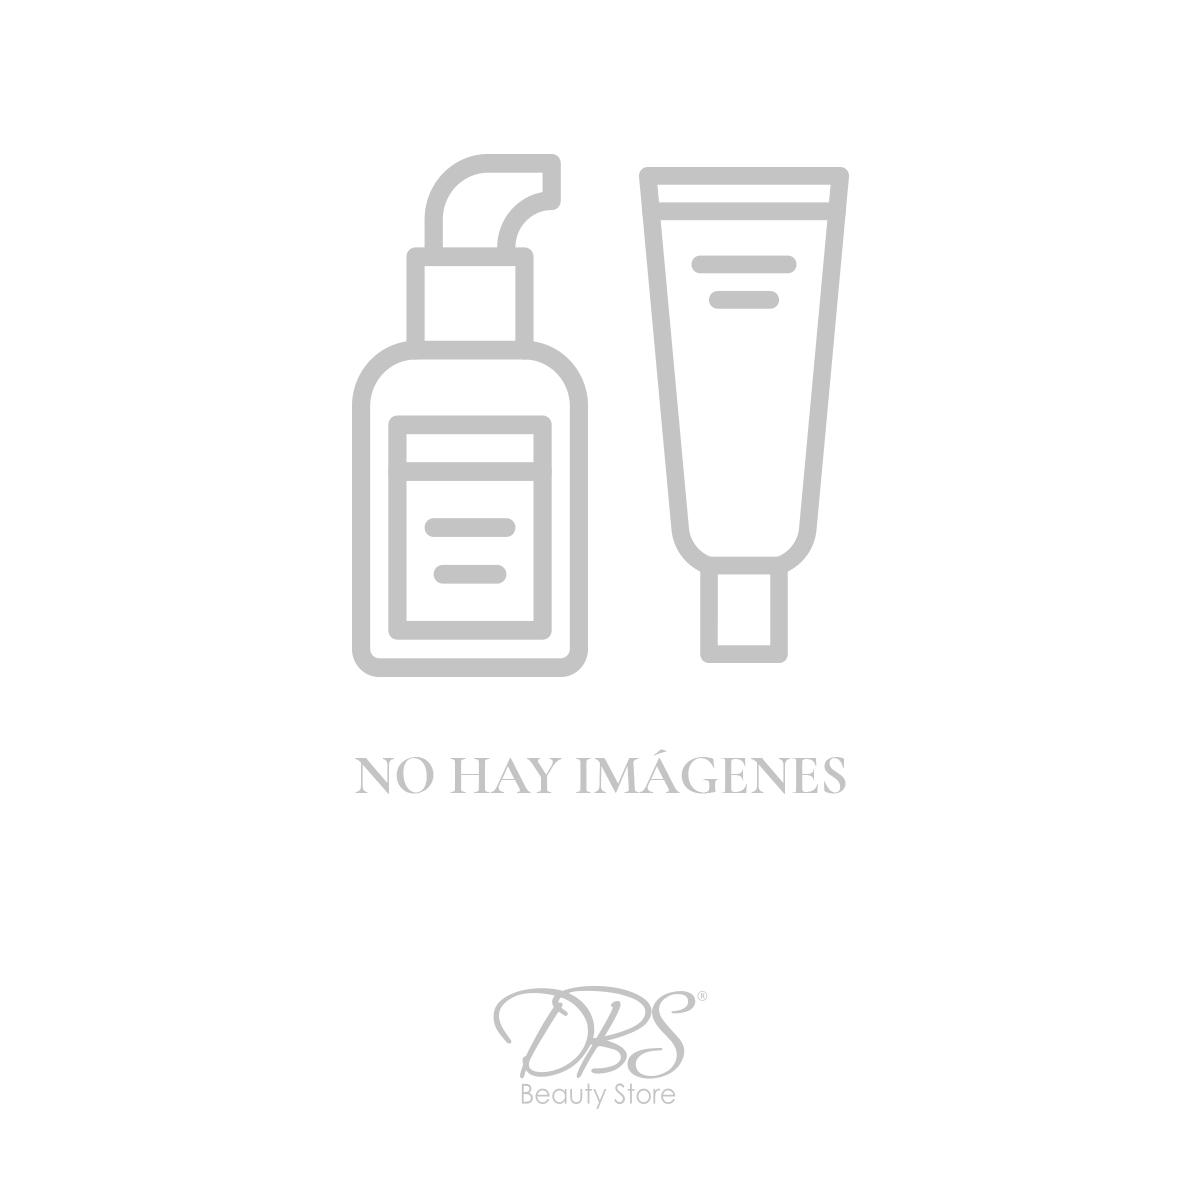 makeup-revolution-RT-31520.jpg